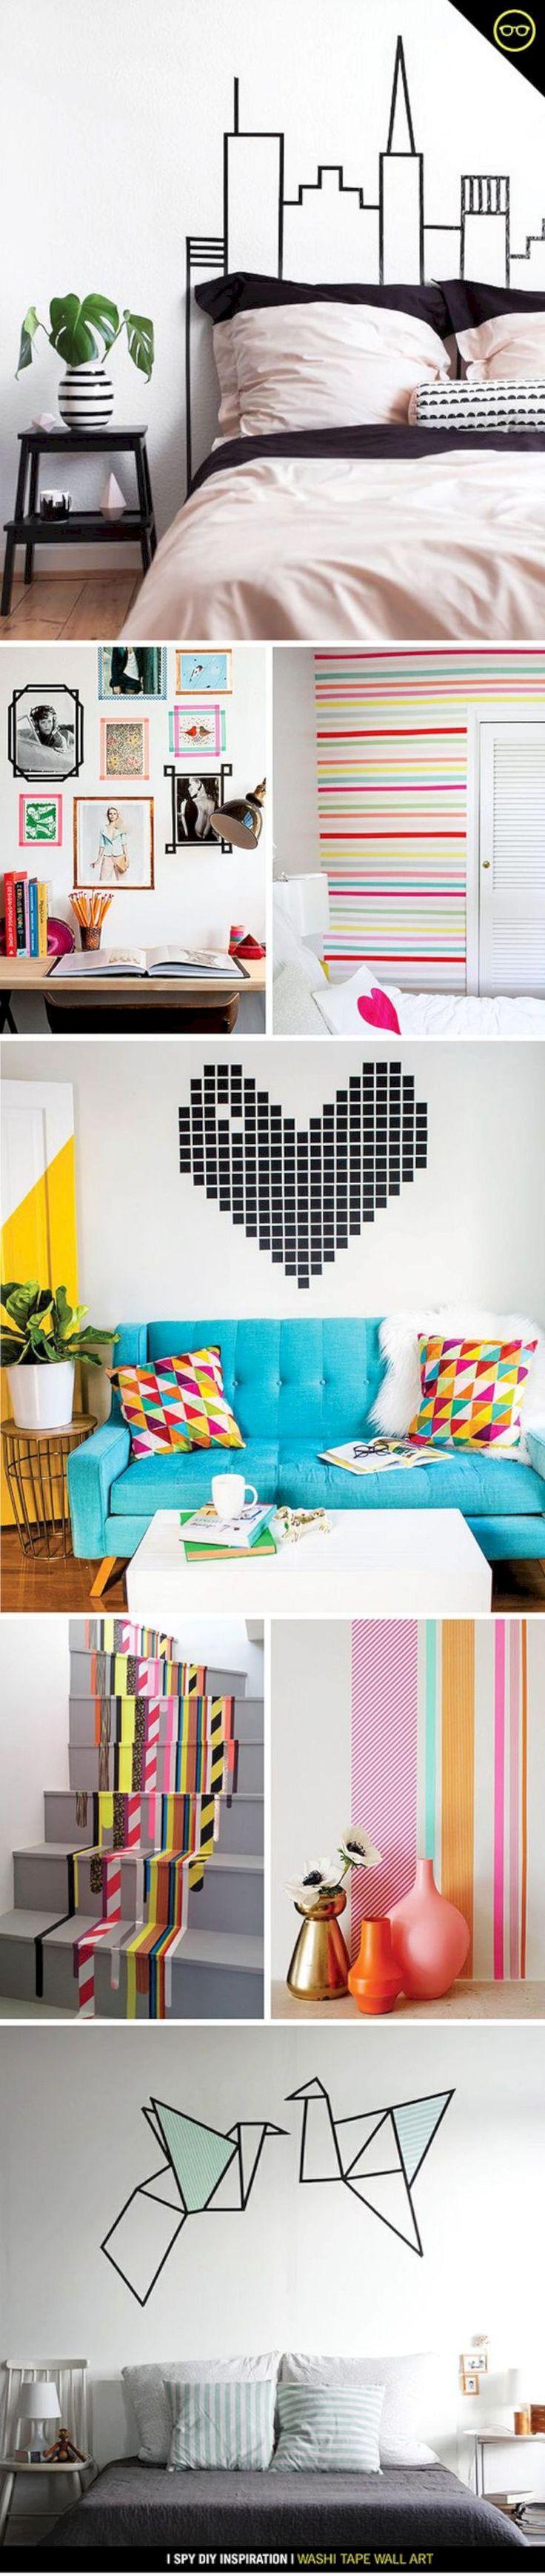 Best 25 Bare Wall Ideas Ideas On Pinterest Dining Room